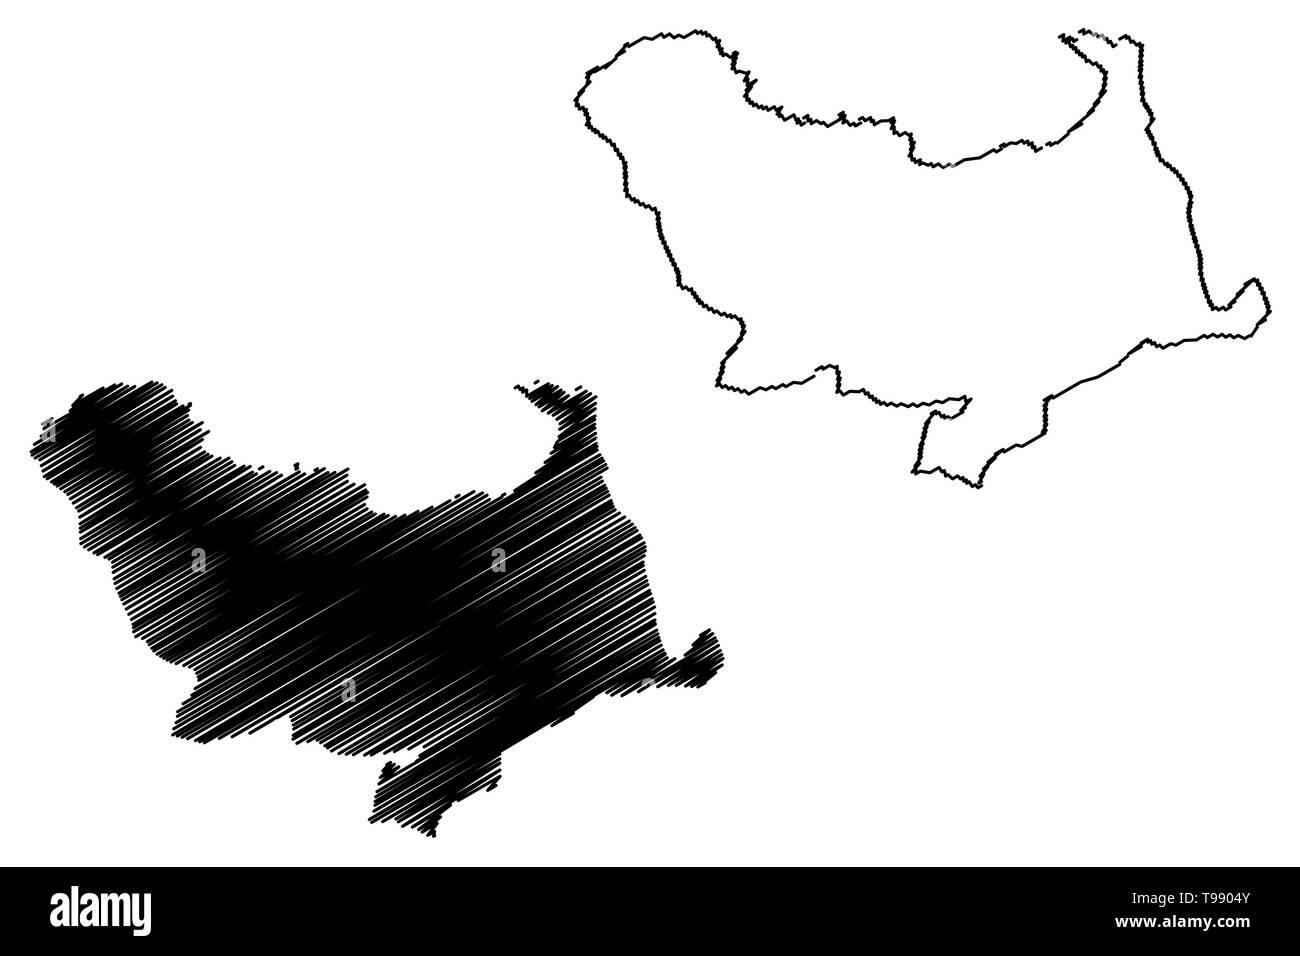 Skikda Province (Provinces of Algeria, Peoples Democratic Republic of Algeria) map vector illustration, scribble sketch Skikda map - Stock Image